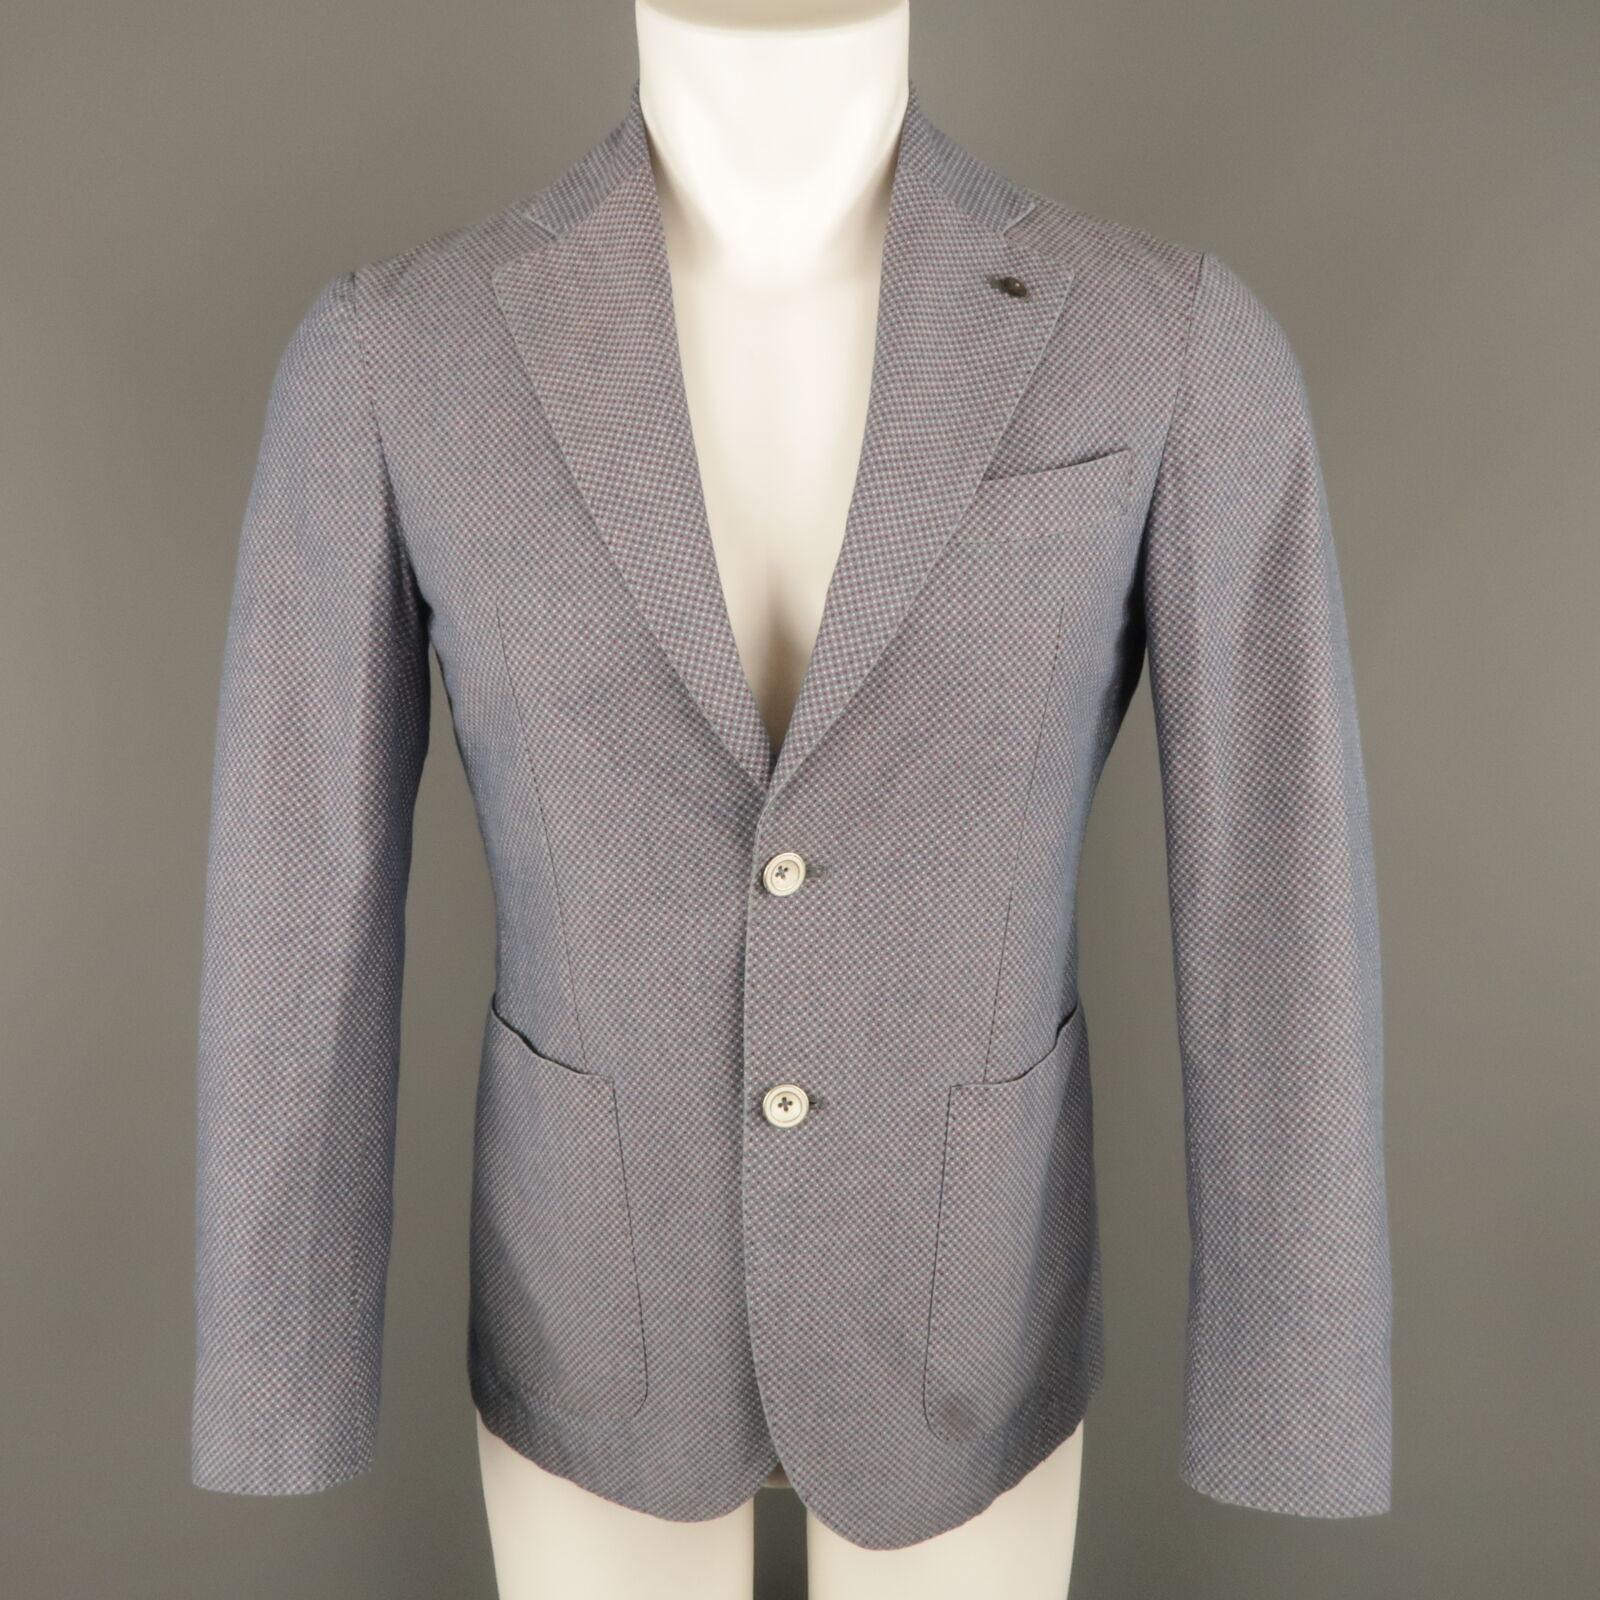 L.B.M. 1911 34 Short bluee & Burgundy Polka Dot Cotton Notch Lapel Sport Coat